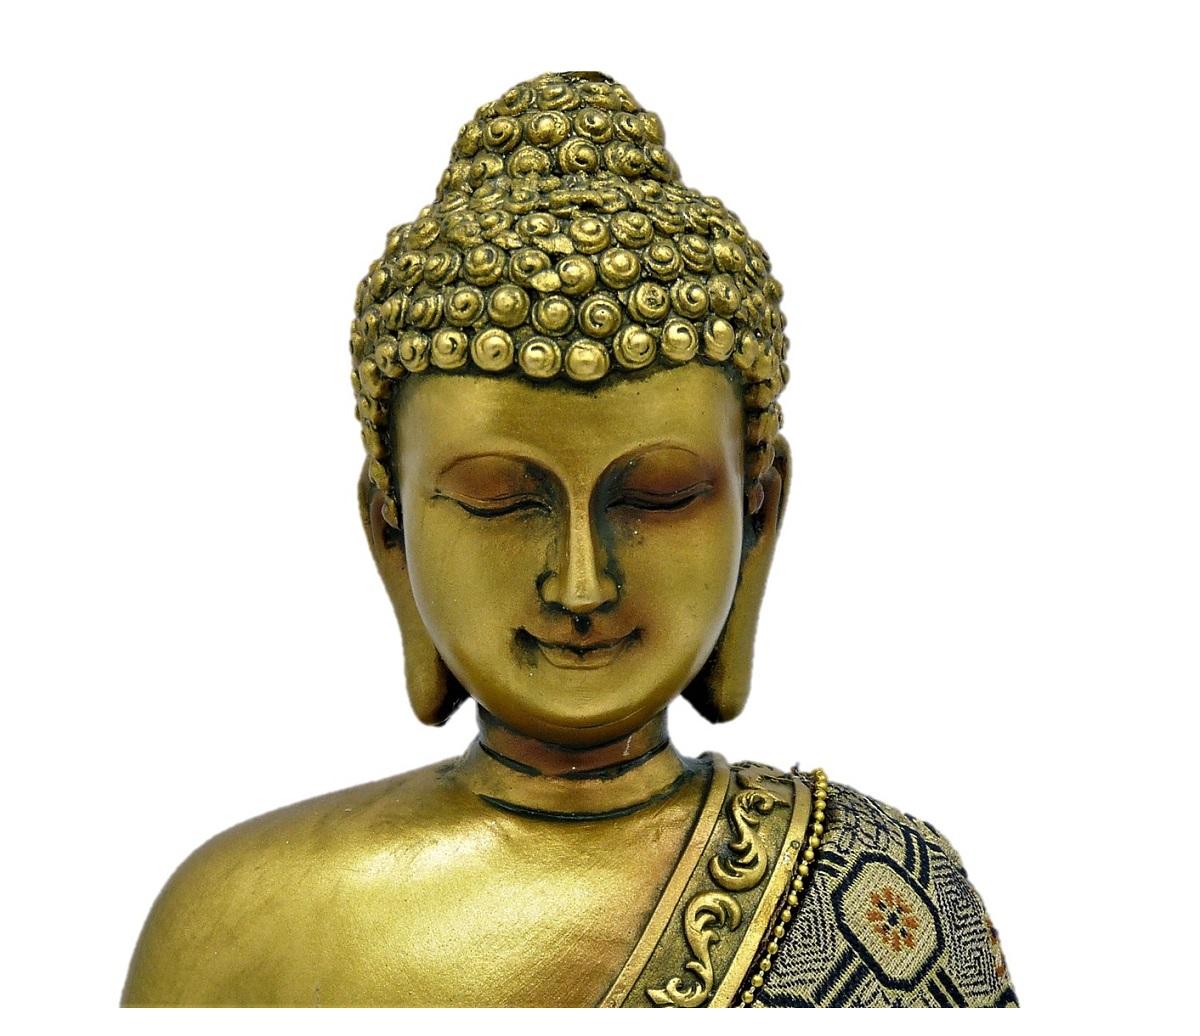 buddha in gold 23 cm mit stoffgewand feng shui figur buddhismus ebay. Black Bedroom Furniture Sets. Home Design Ideas